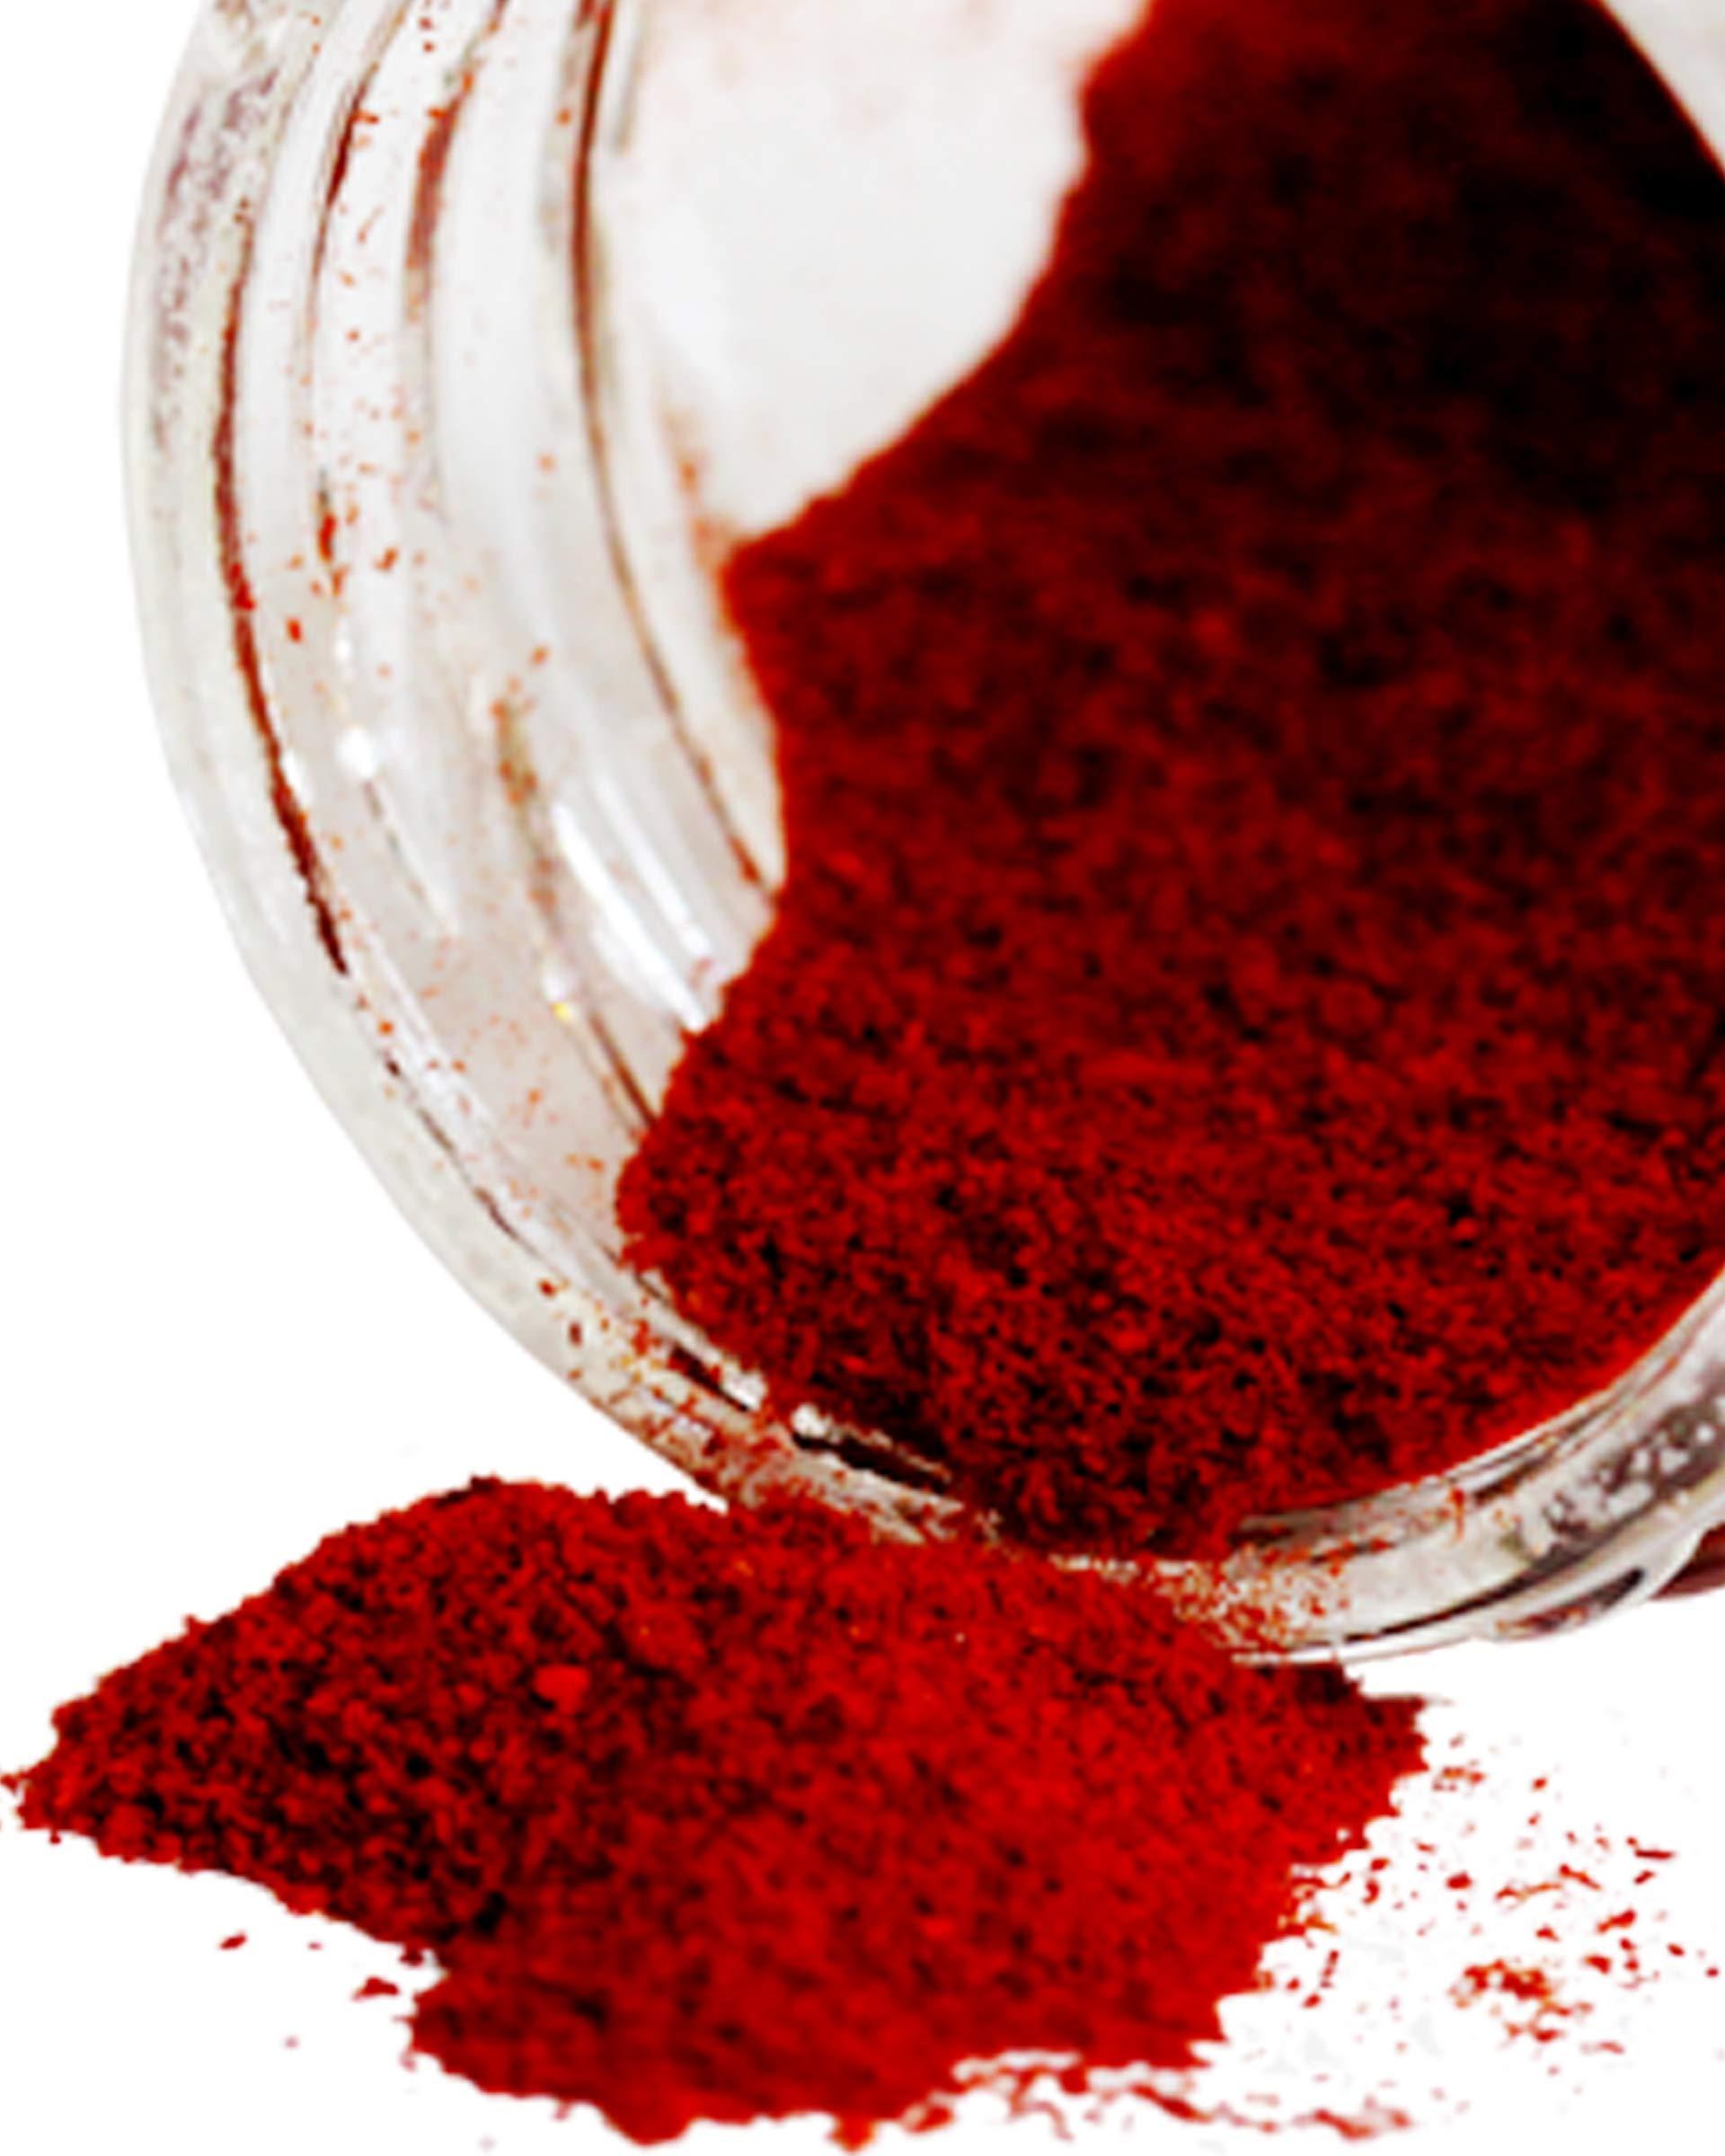 Exir Saffron Powdered (10-grams) - Sprinkle Herb and Spice Seasoning by EXIR (Image #2)